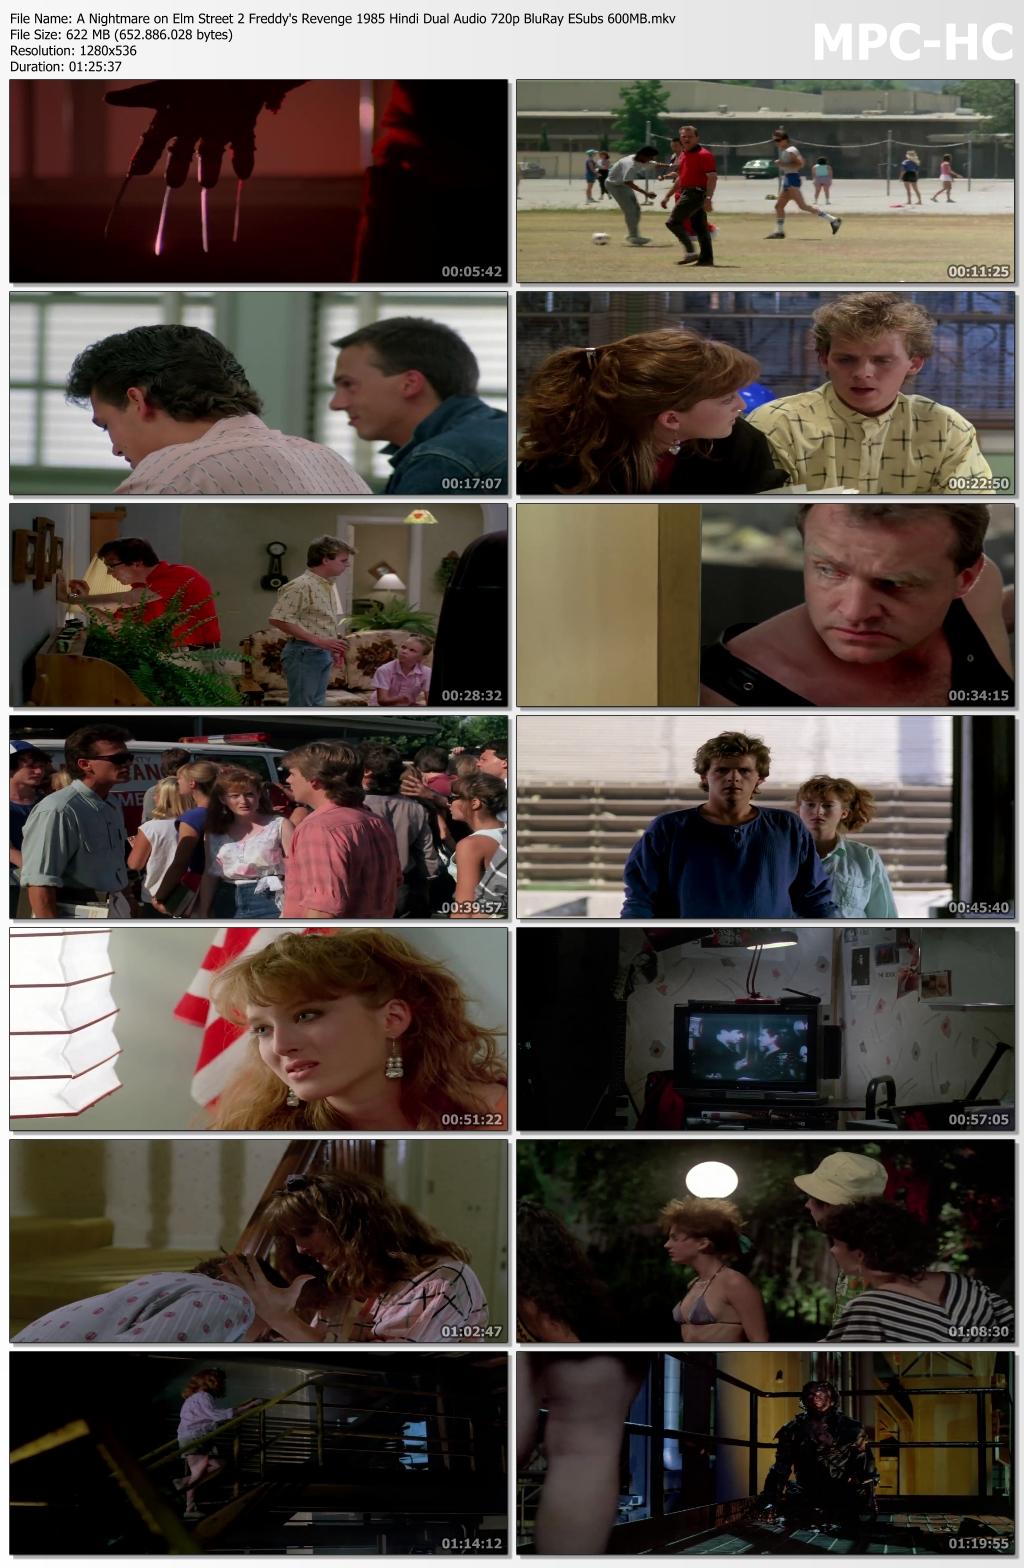 A-Nightmare-on-Elm-Street-2-Freddy-s-Revenge-1985-Hindi-Dual-Audio-720p-Blu-Ray-ESubs-600-MB-mkv-thu